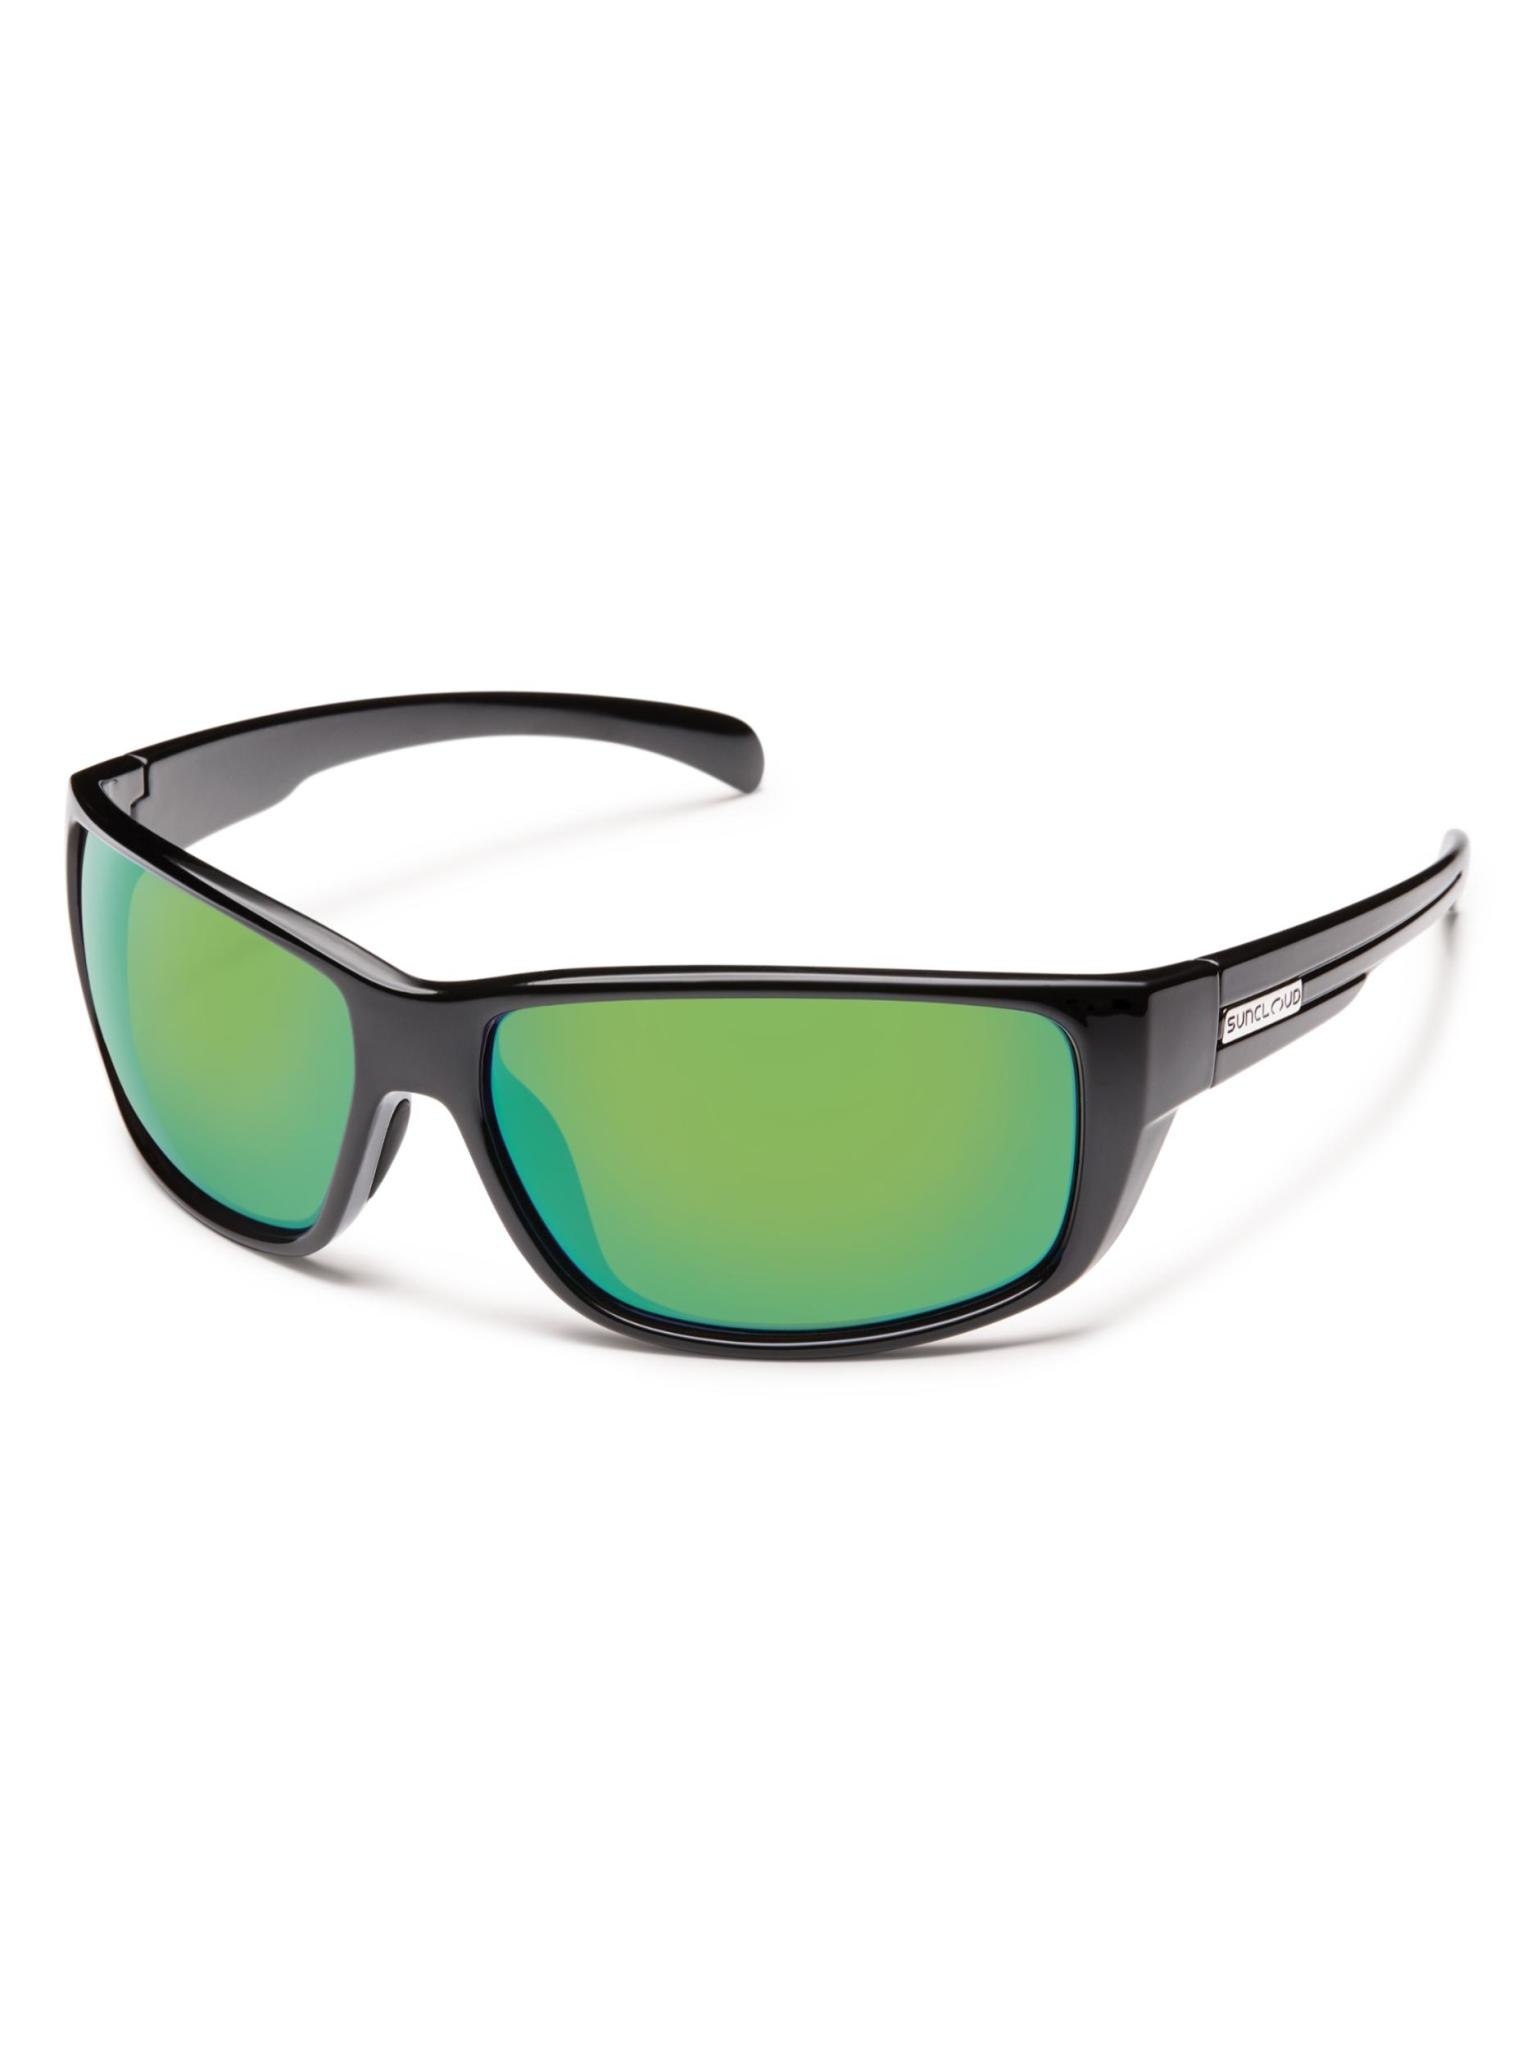 Milestone Sunglasses Black Polarized Green Mirror